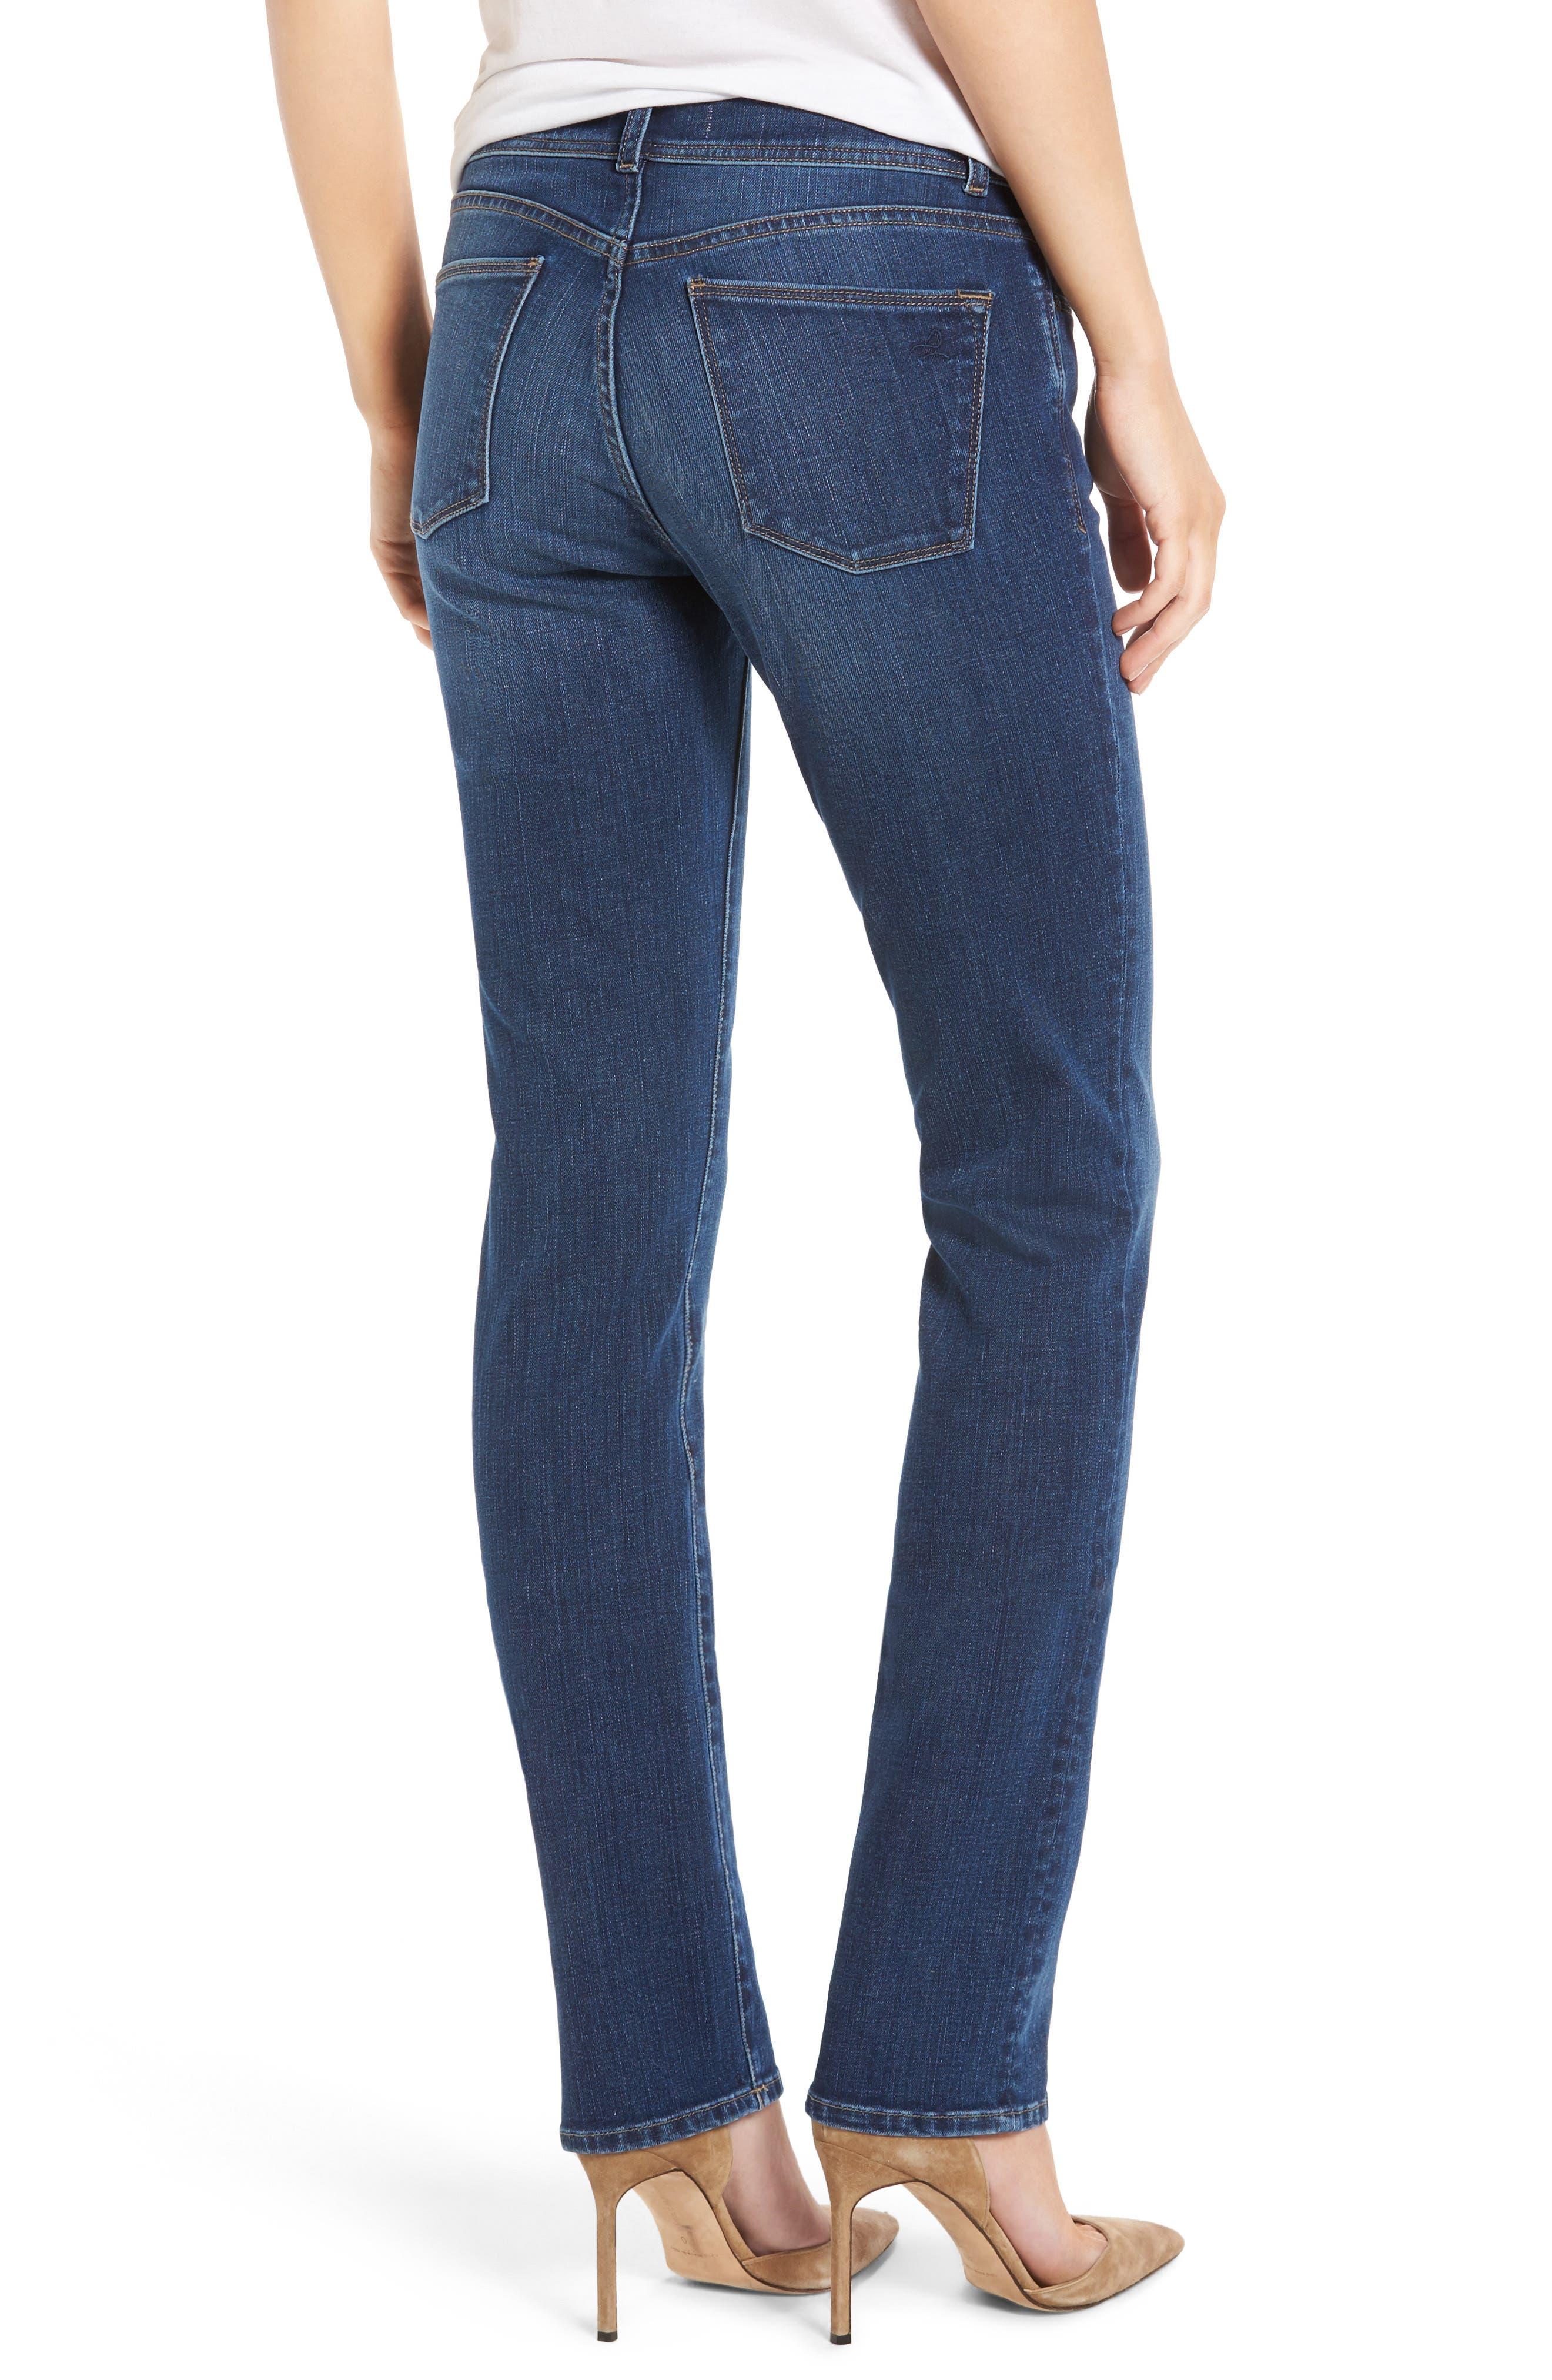 Coco Curvy Straight Leg Jeans,                             Alternate thumbnail 2, color,                             405